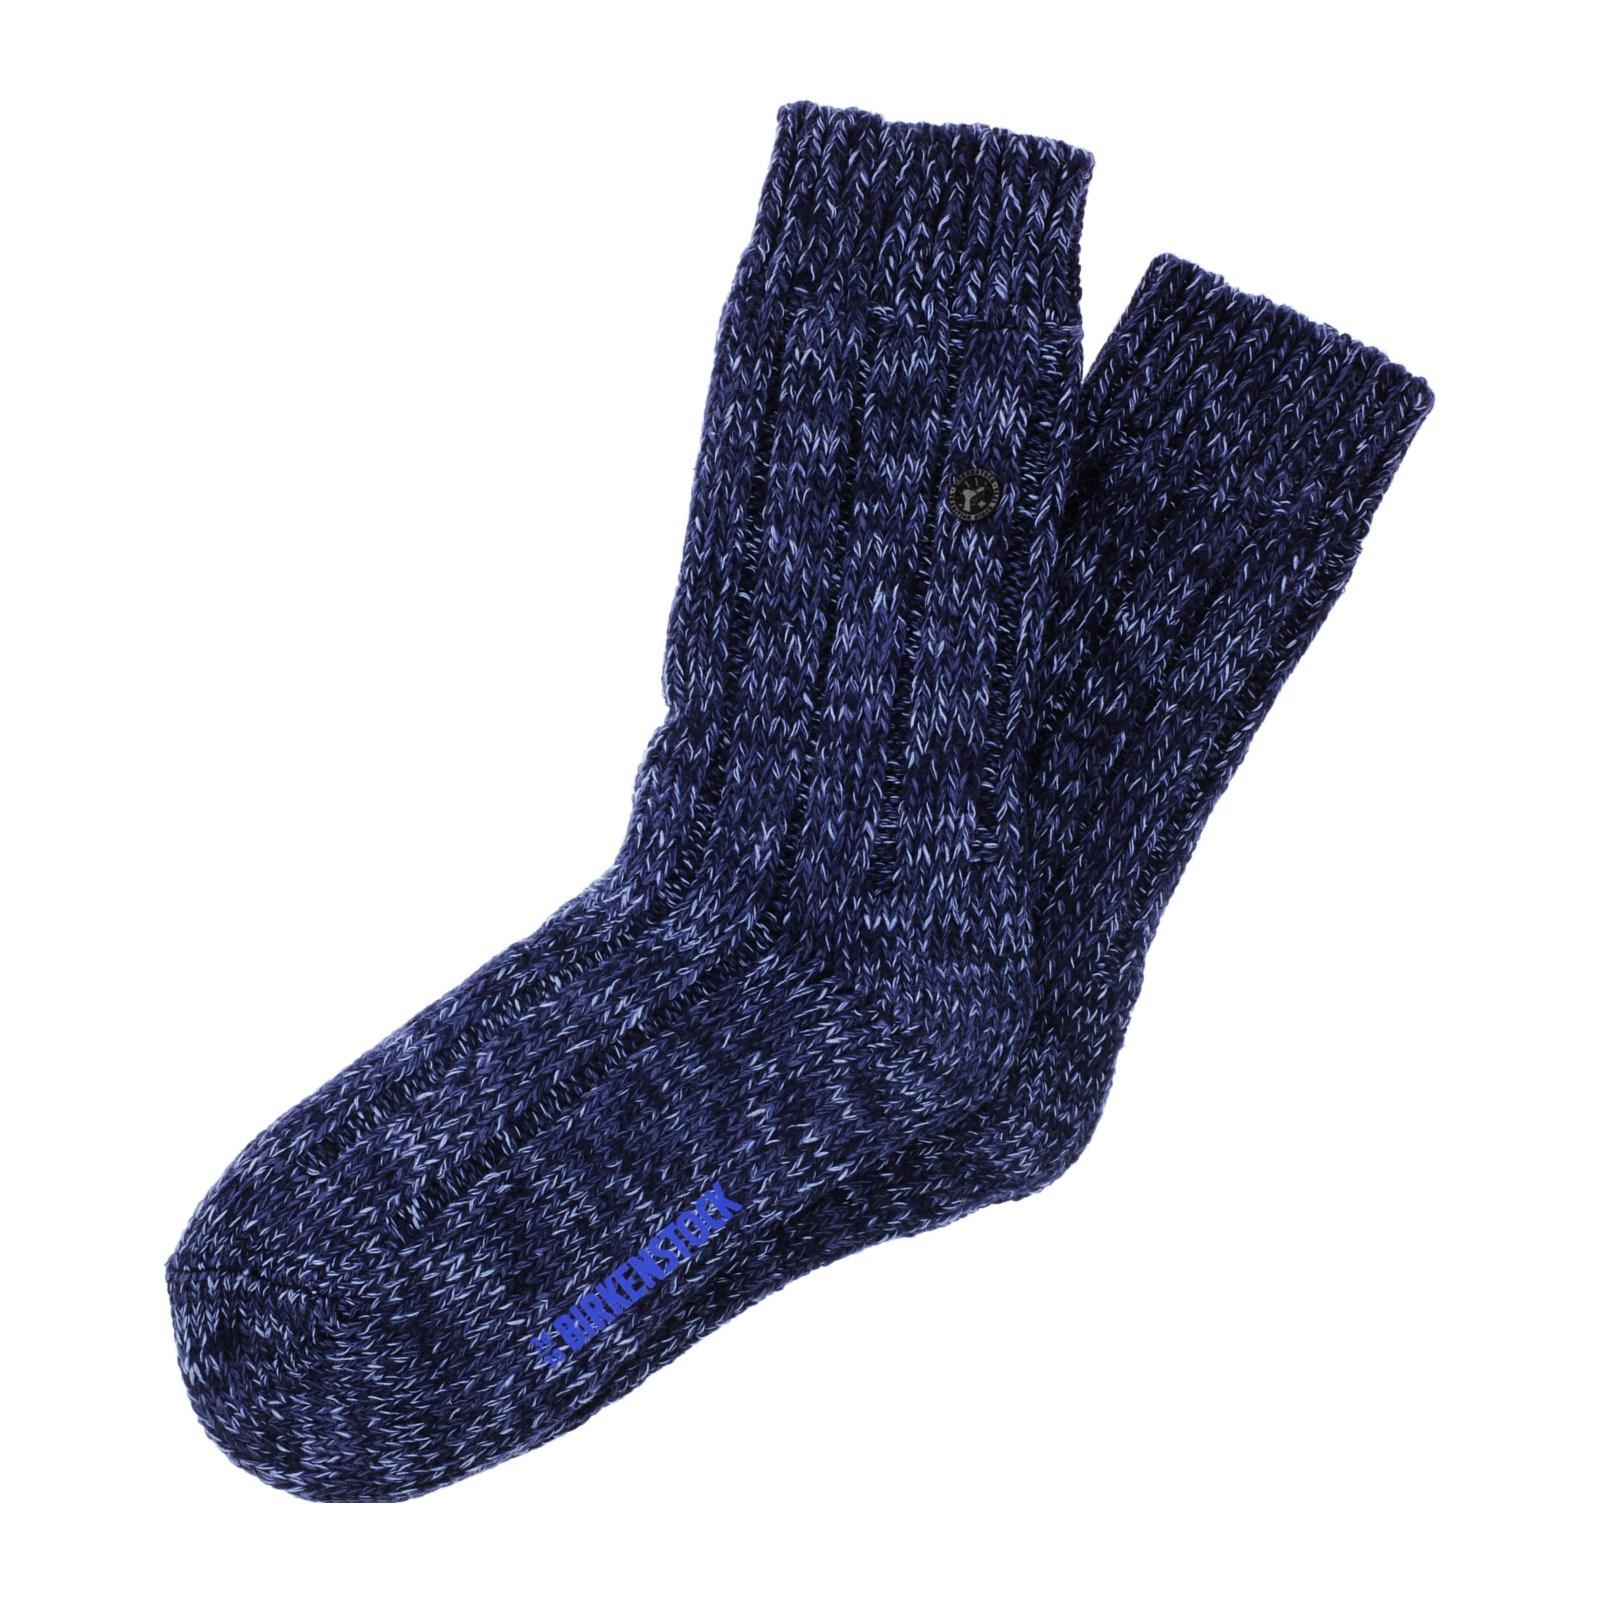 Birkenstock Damen Socken Cotton Bling Glitzer Socken Hellgrau Meliert